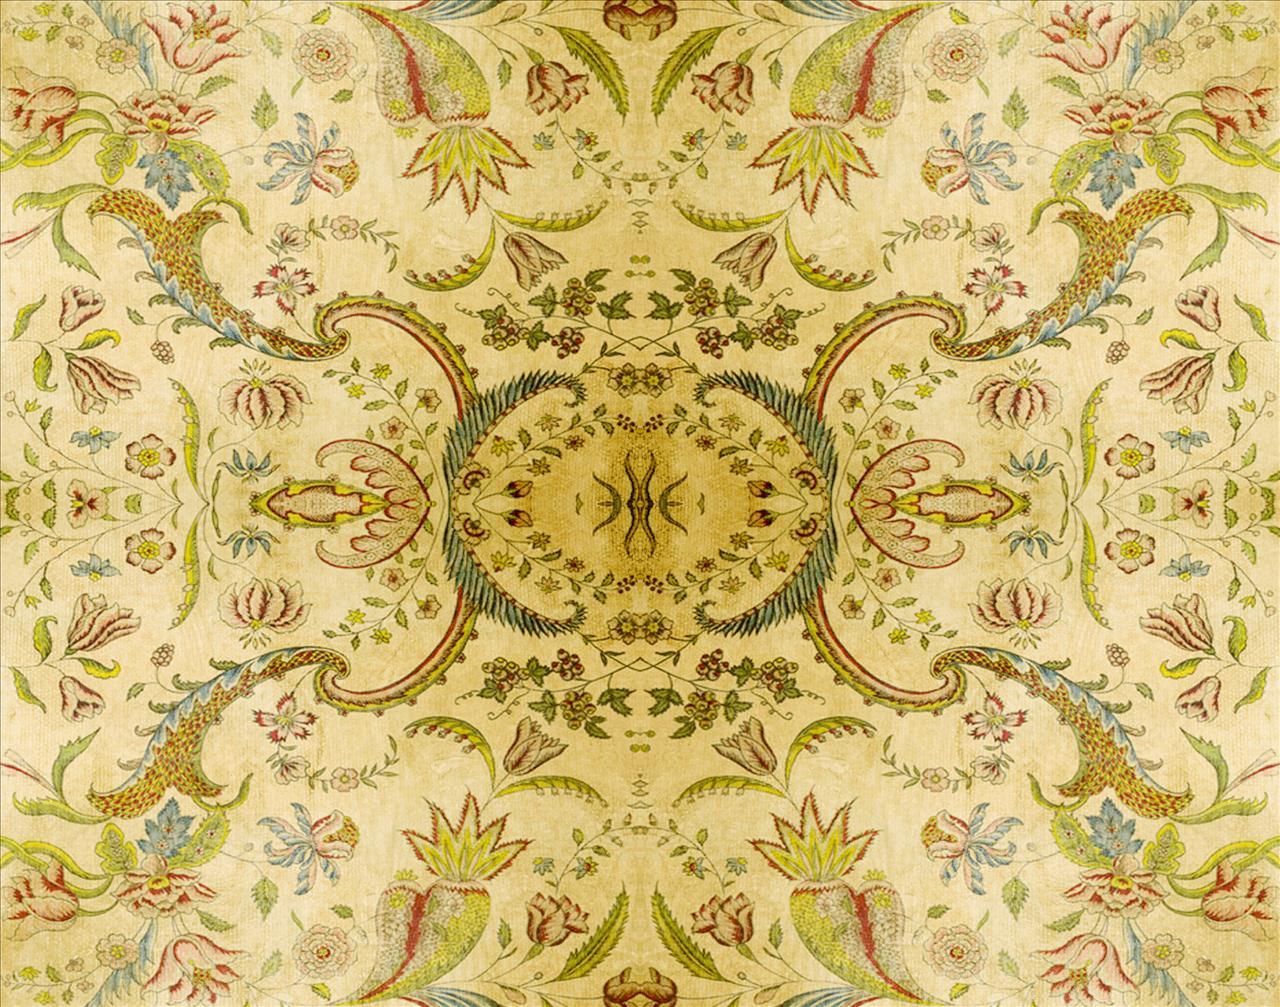 http://2.bp.blogspot.com/_2YXmsOZYCak/TF1__CZ2xTI/AAAAAAAAAyg/z_8drTSIWTs/s1600/vintage_wallpaper.jpg